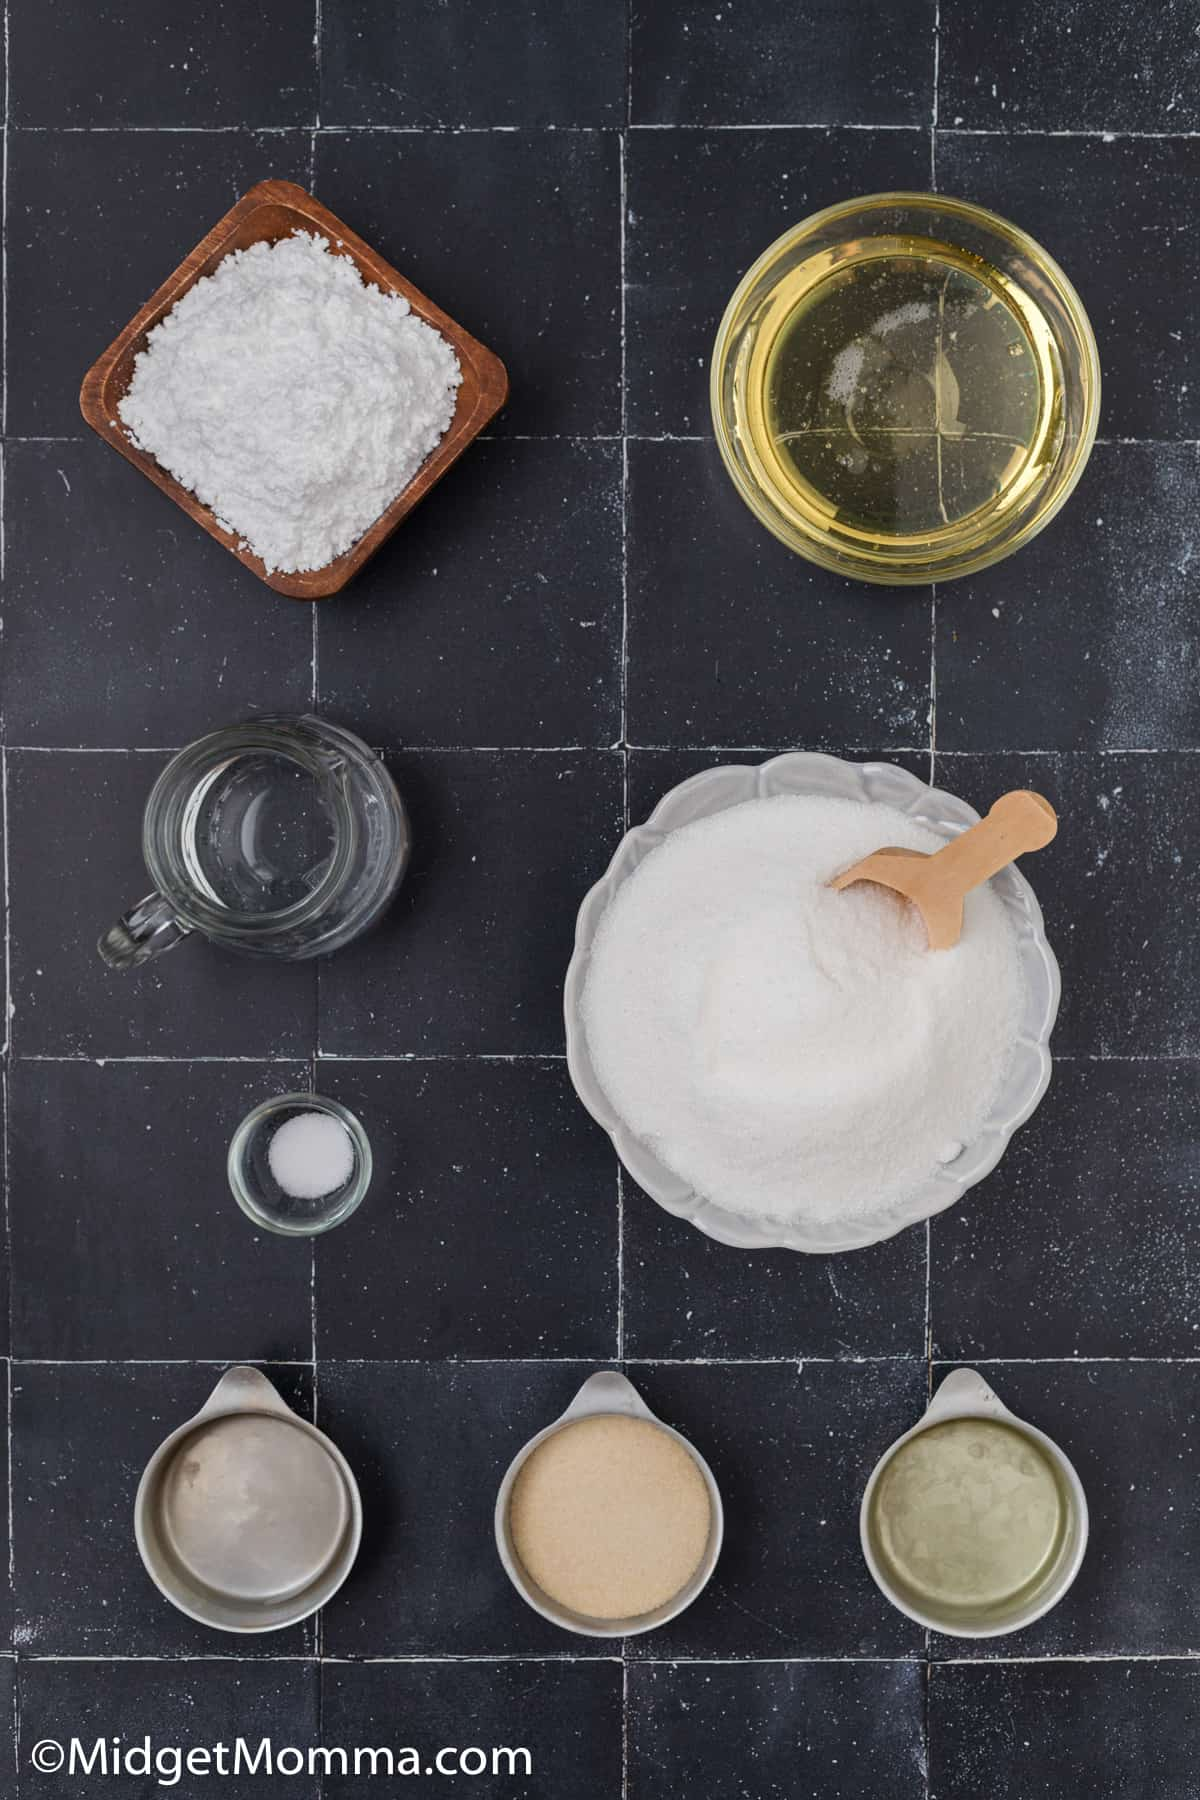 Homemade Marshmallows Recipe ingredients